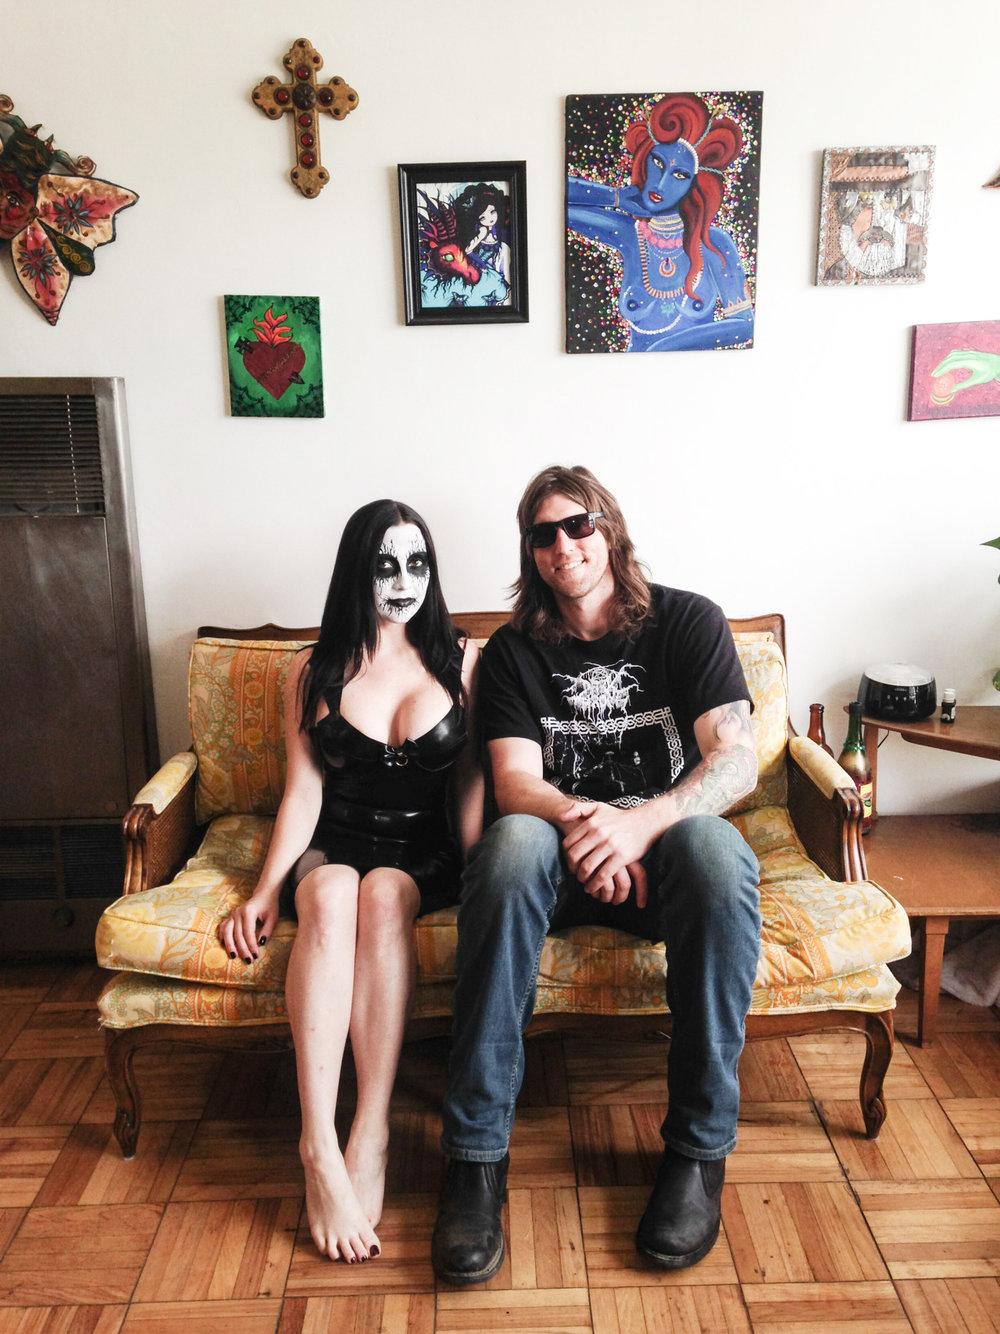 Art Director / Fashion Photographer Bryan Barnes with model Amanda.  Shot in Los Angeles, April 2014.